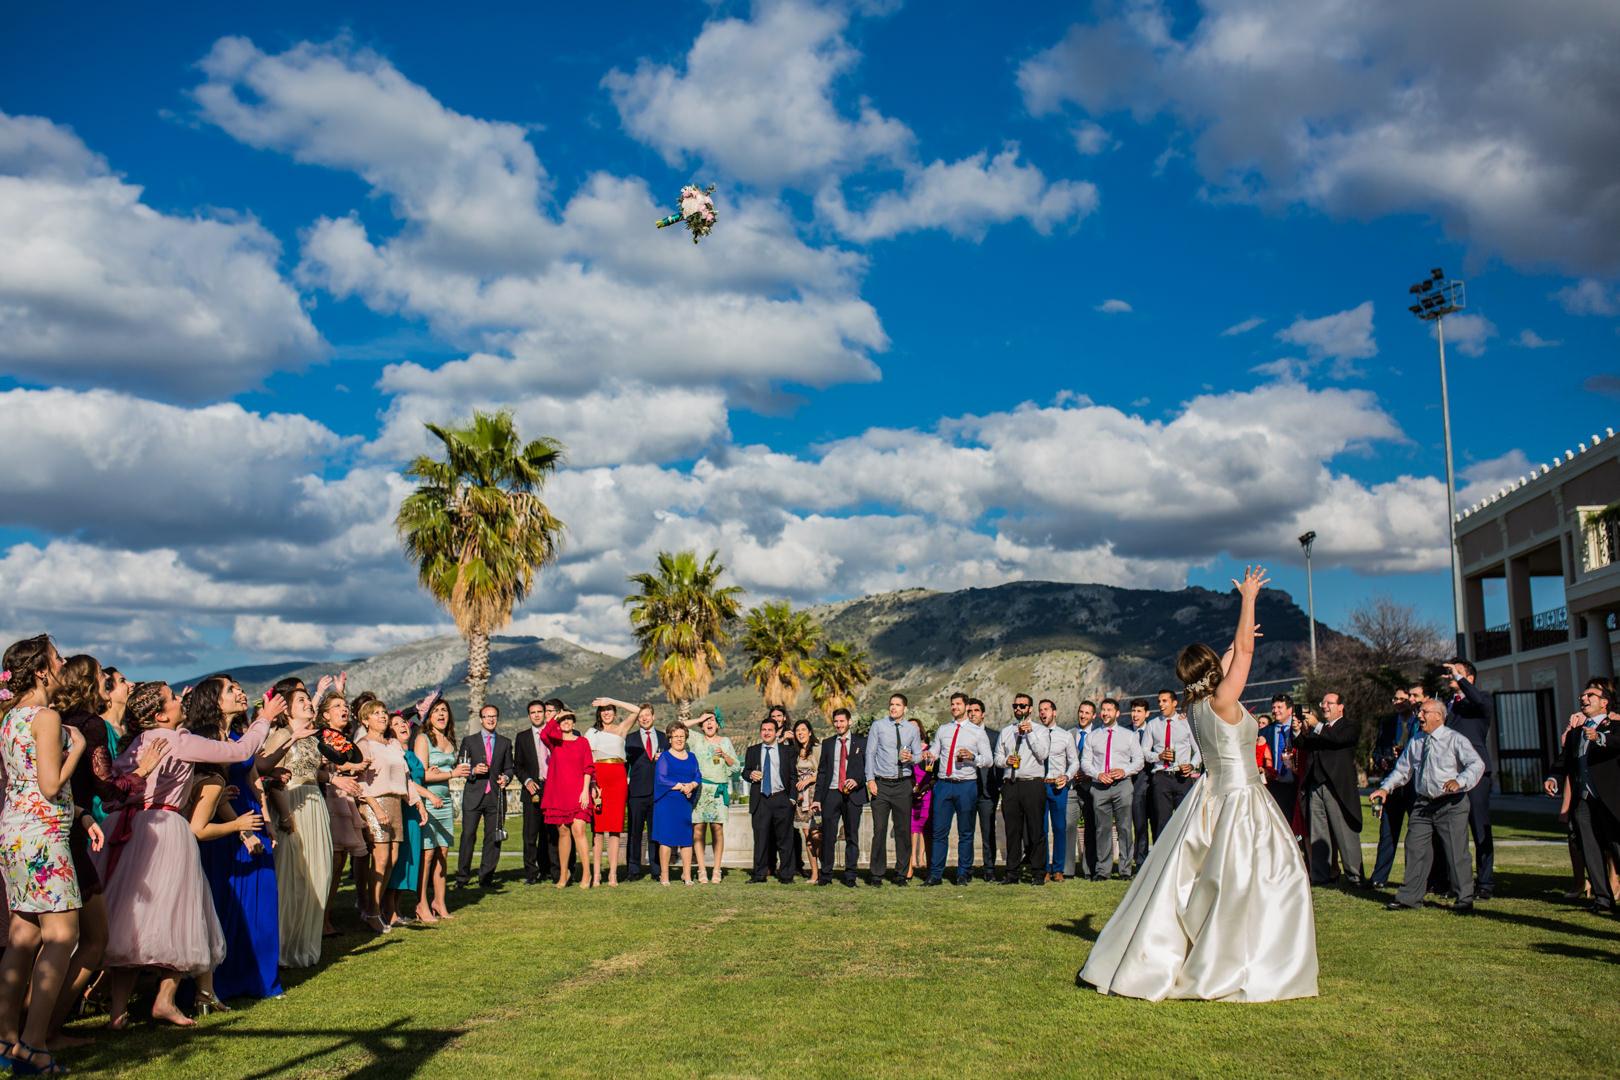 Boda-Catedral-Jaen-Hamburgo-Maria-David-engagement-Rafael-Torres-fotografo-bodas-sevilla-madrid-barcelona-wedding-photographer--45.jpg